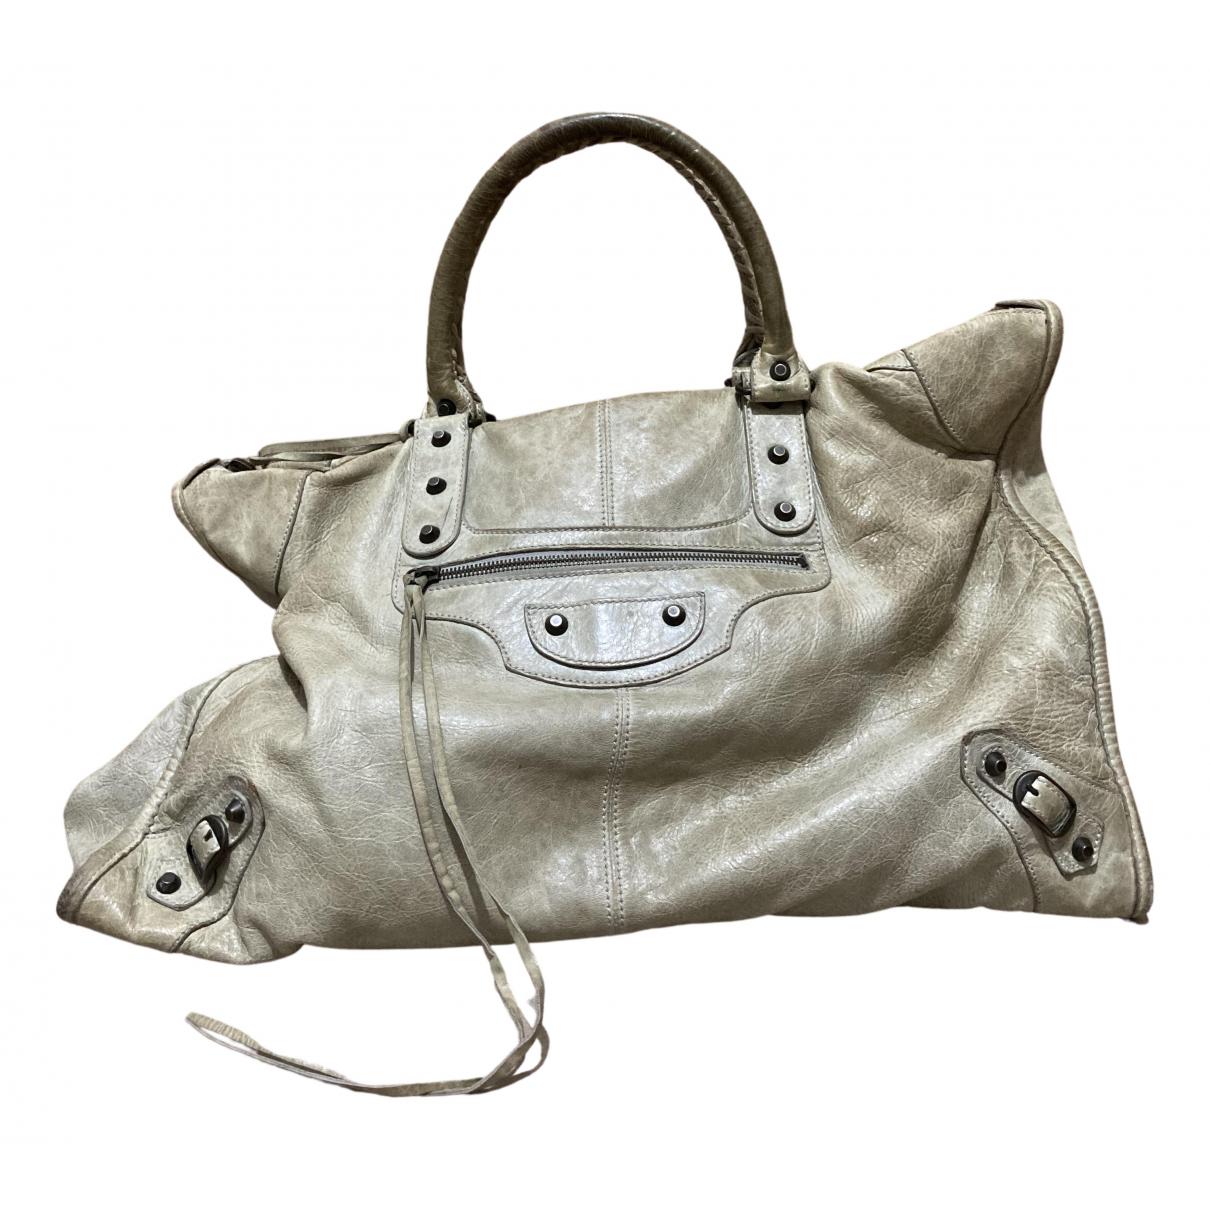 Balenciaga Weekender Beige Leather handbag for Women N